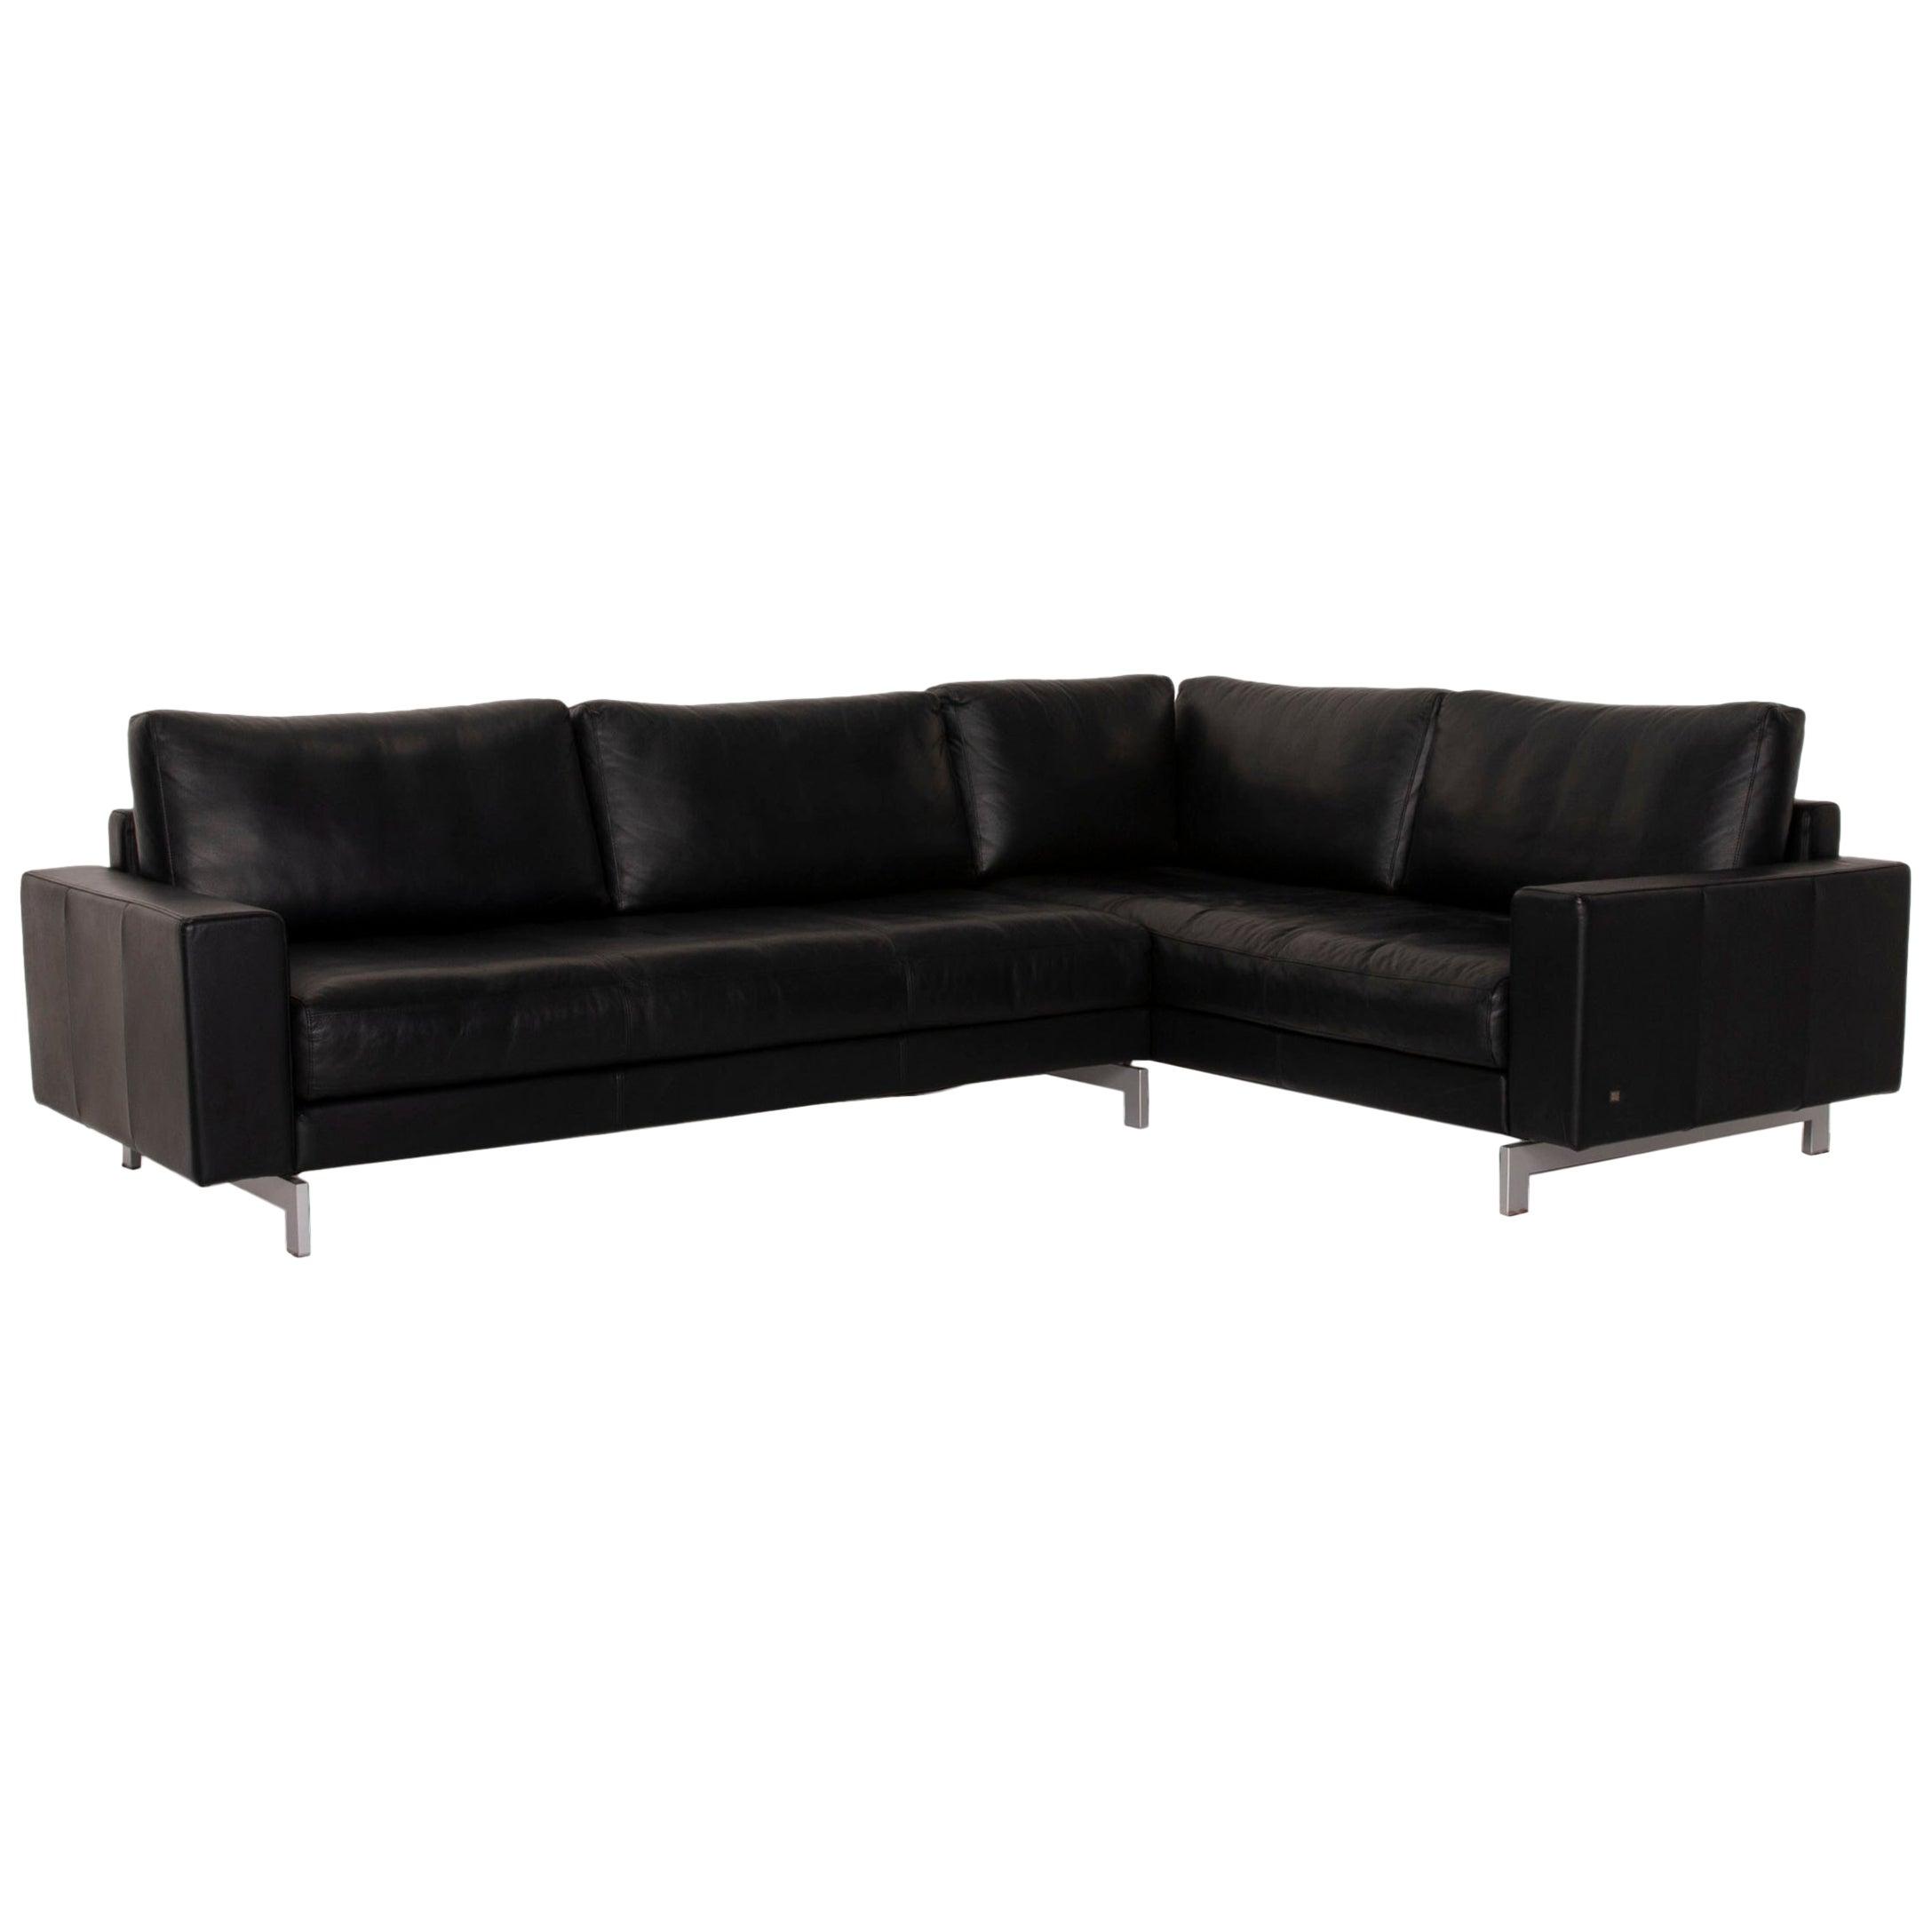 Rolf Benz Vida Leather Sofa Black Corner Sofa